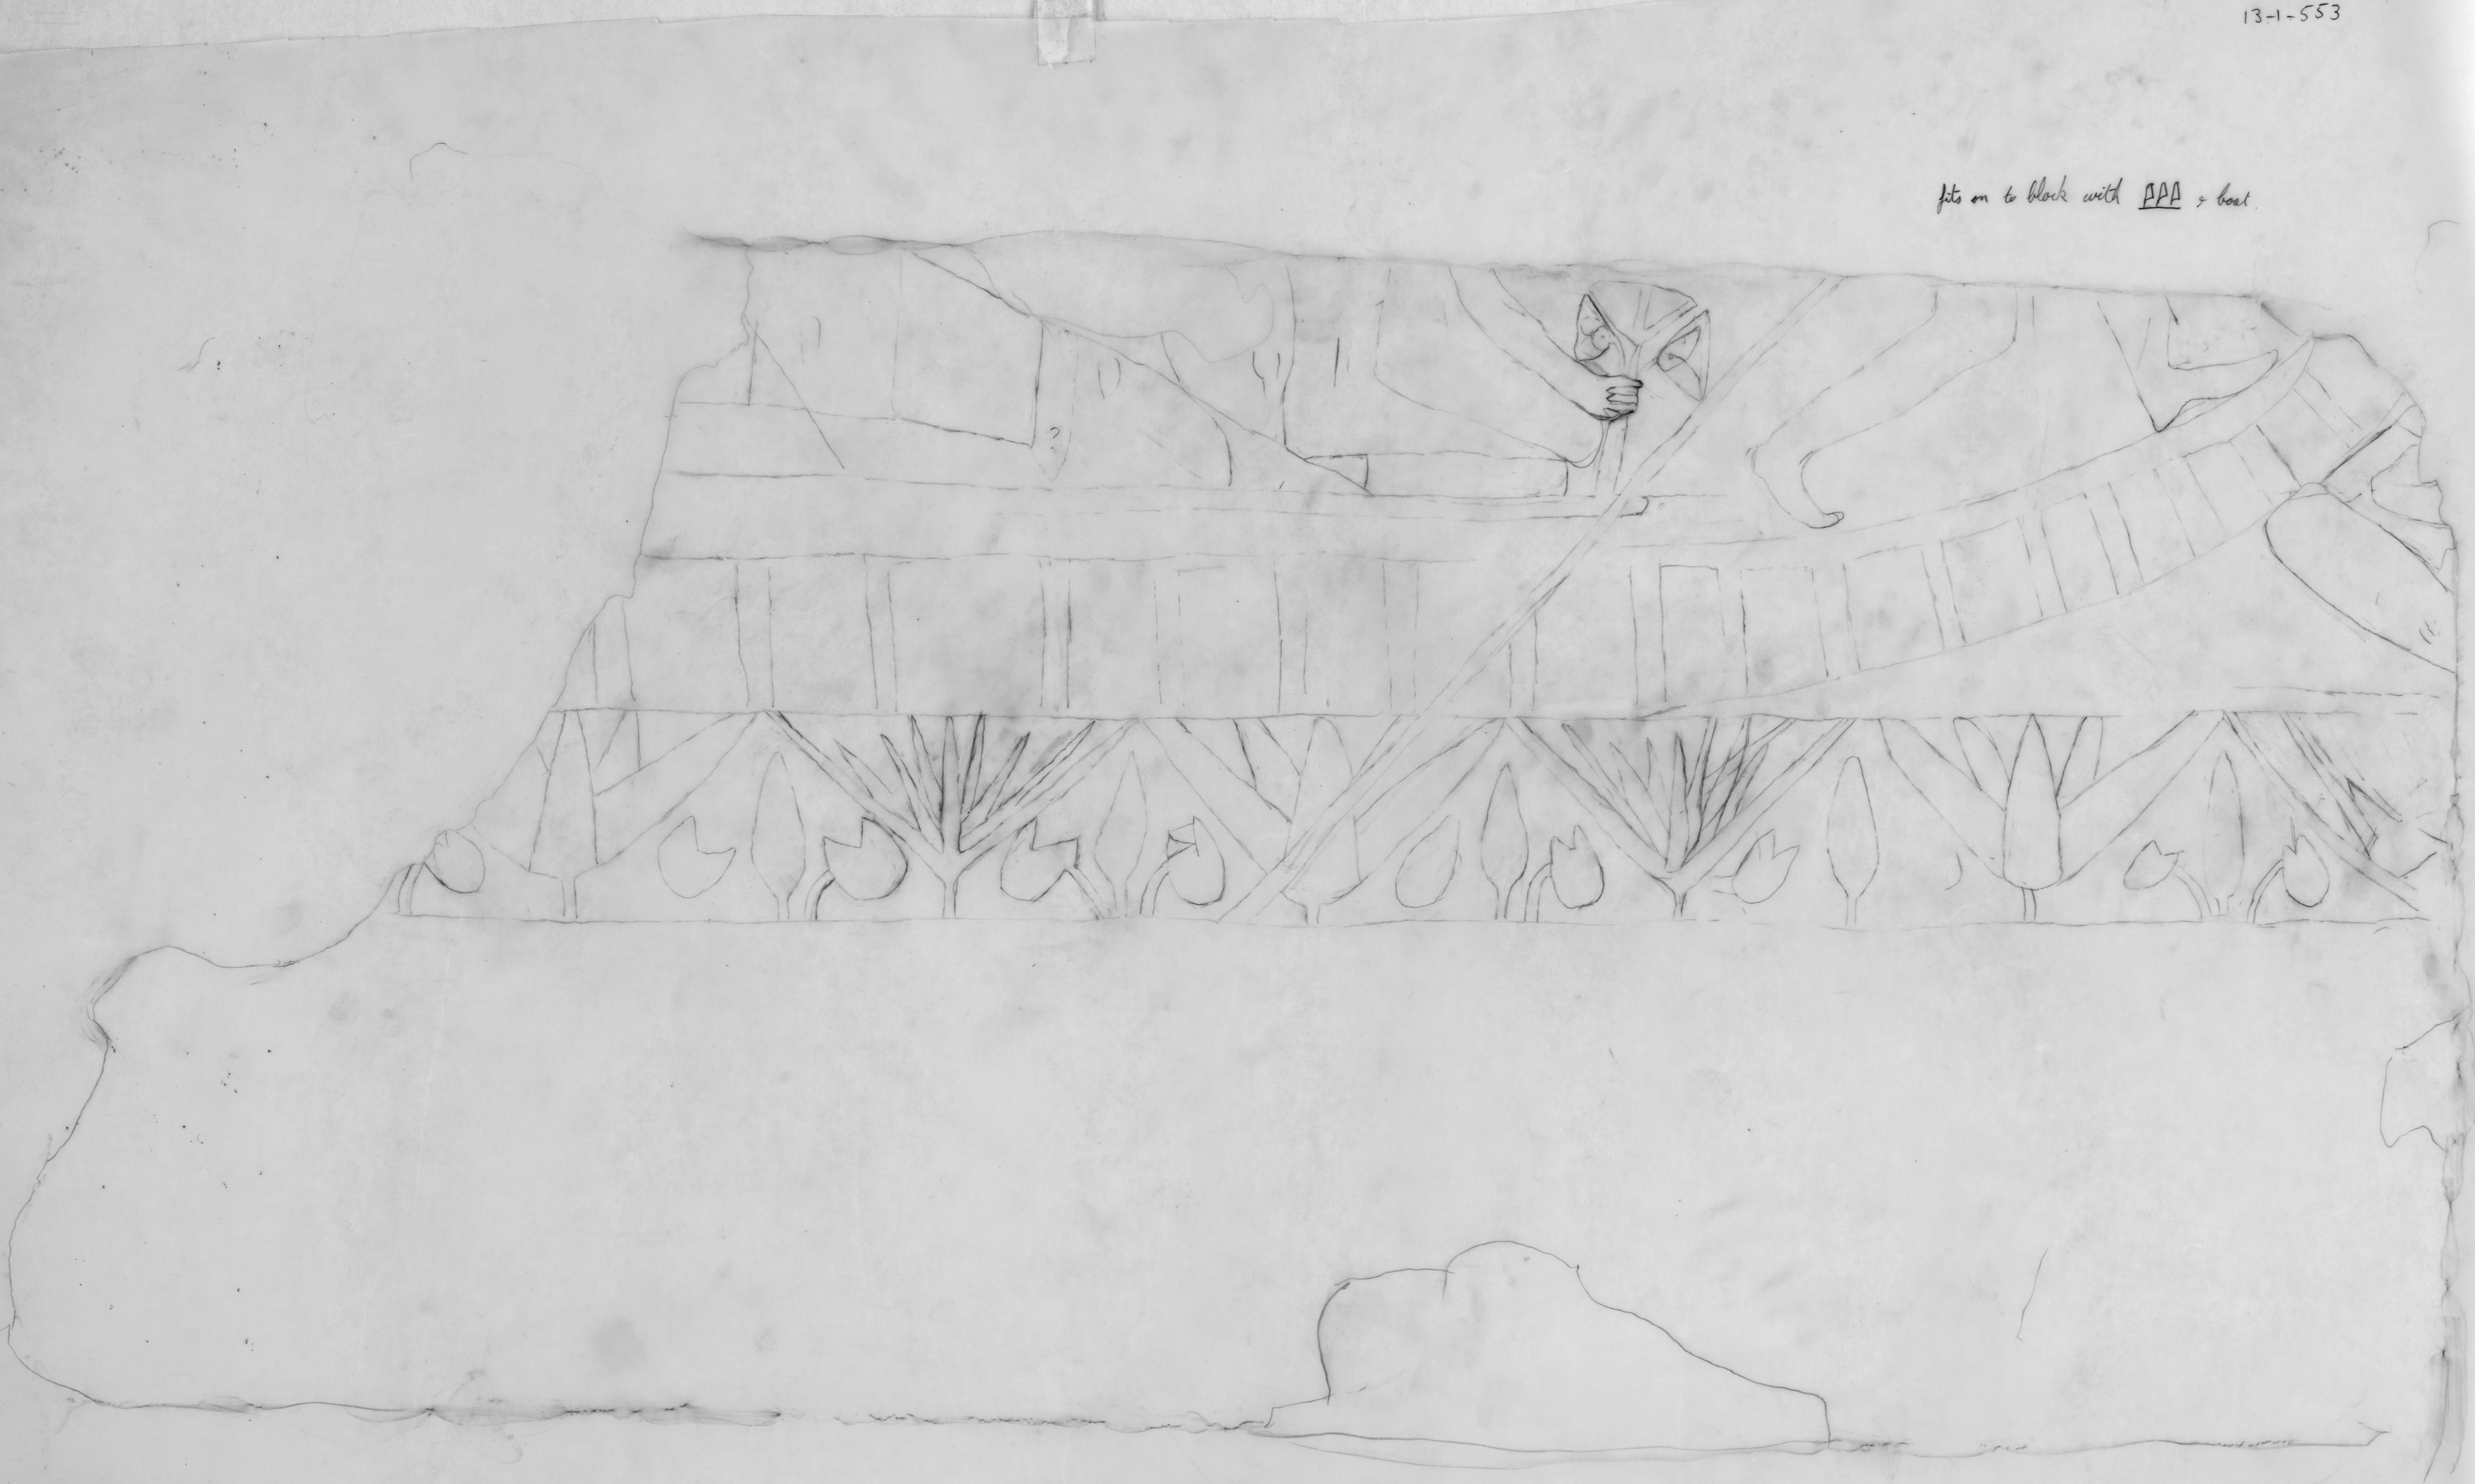 Drawings: G 2381: relief from block, marsh scene